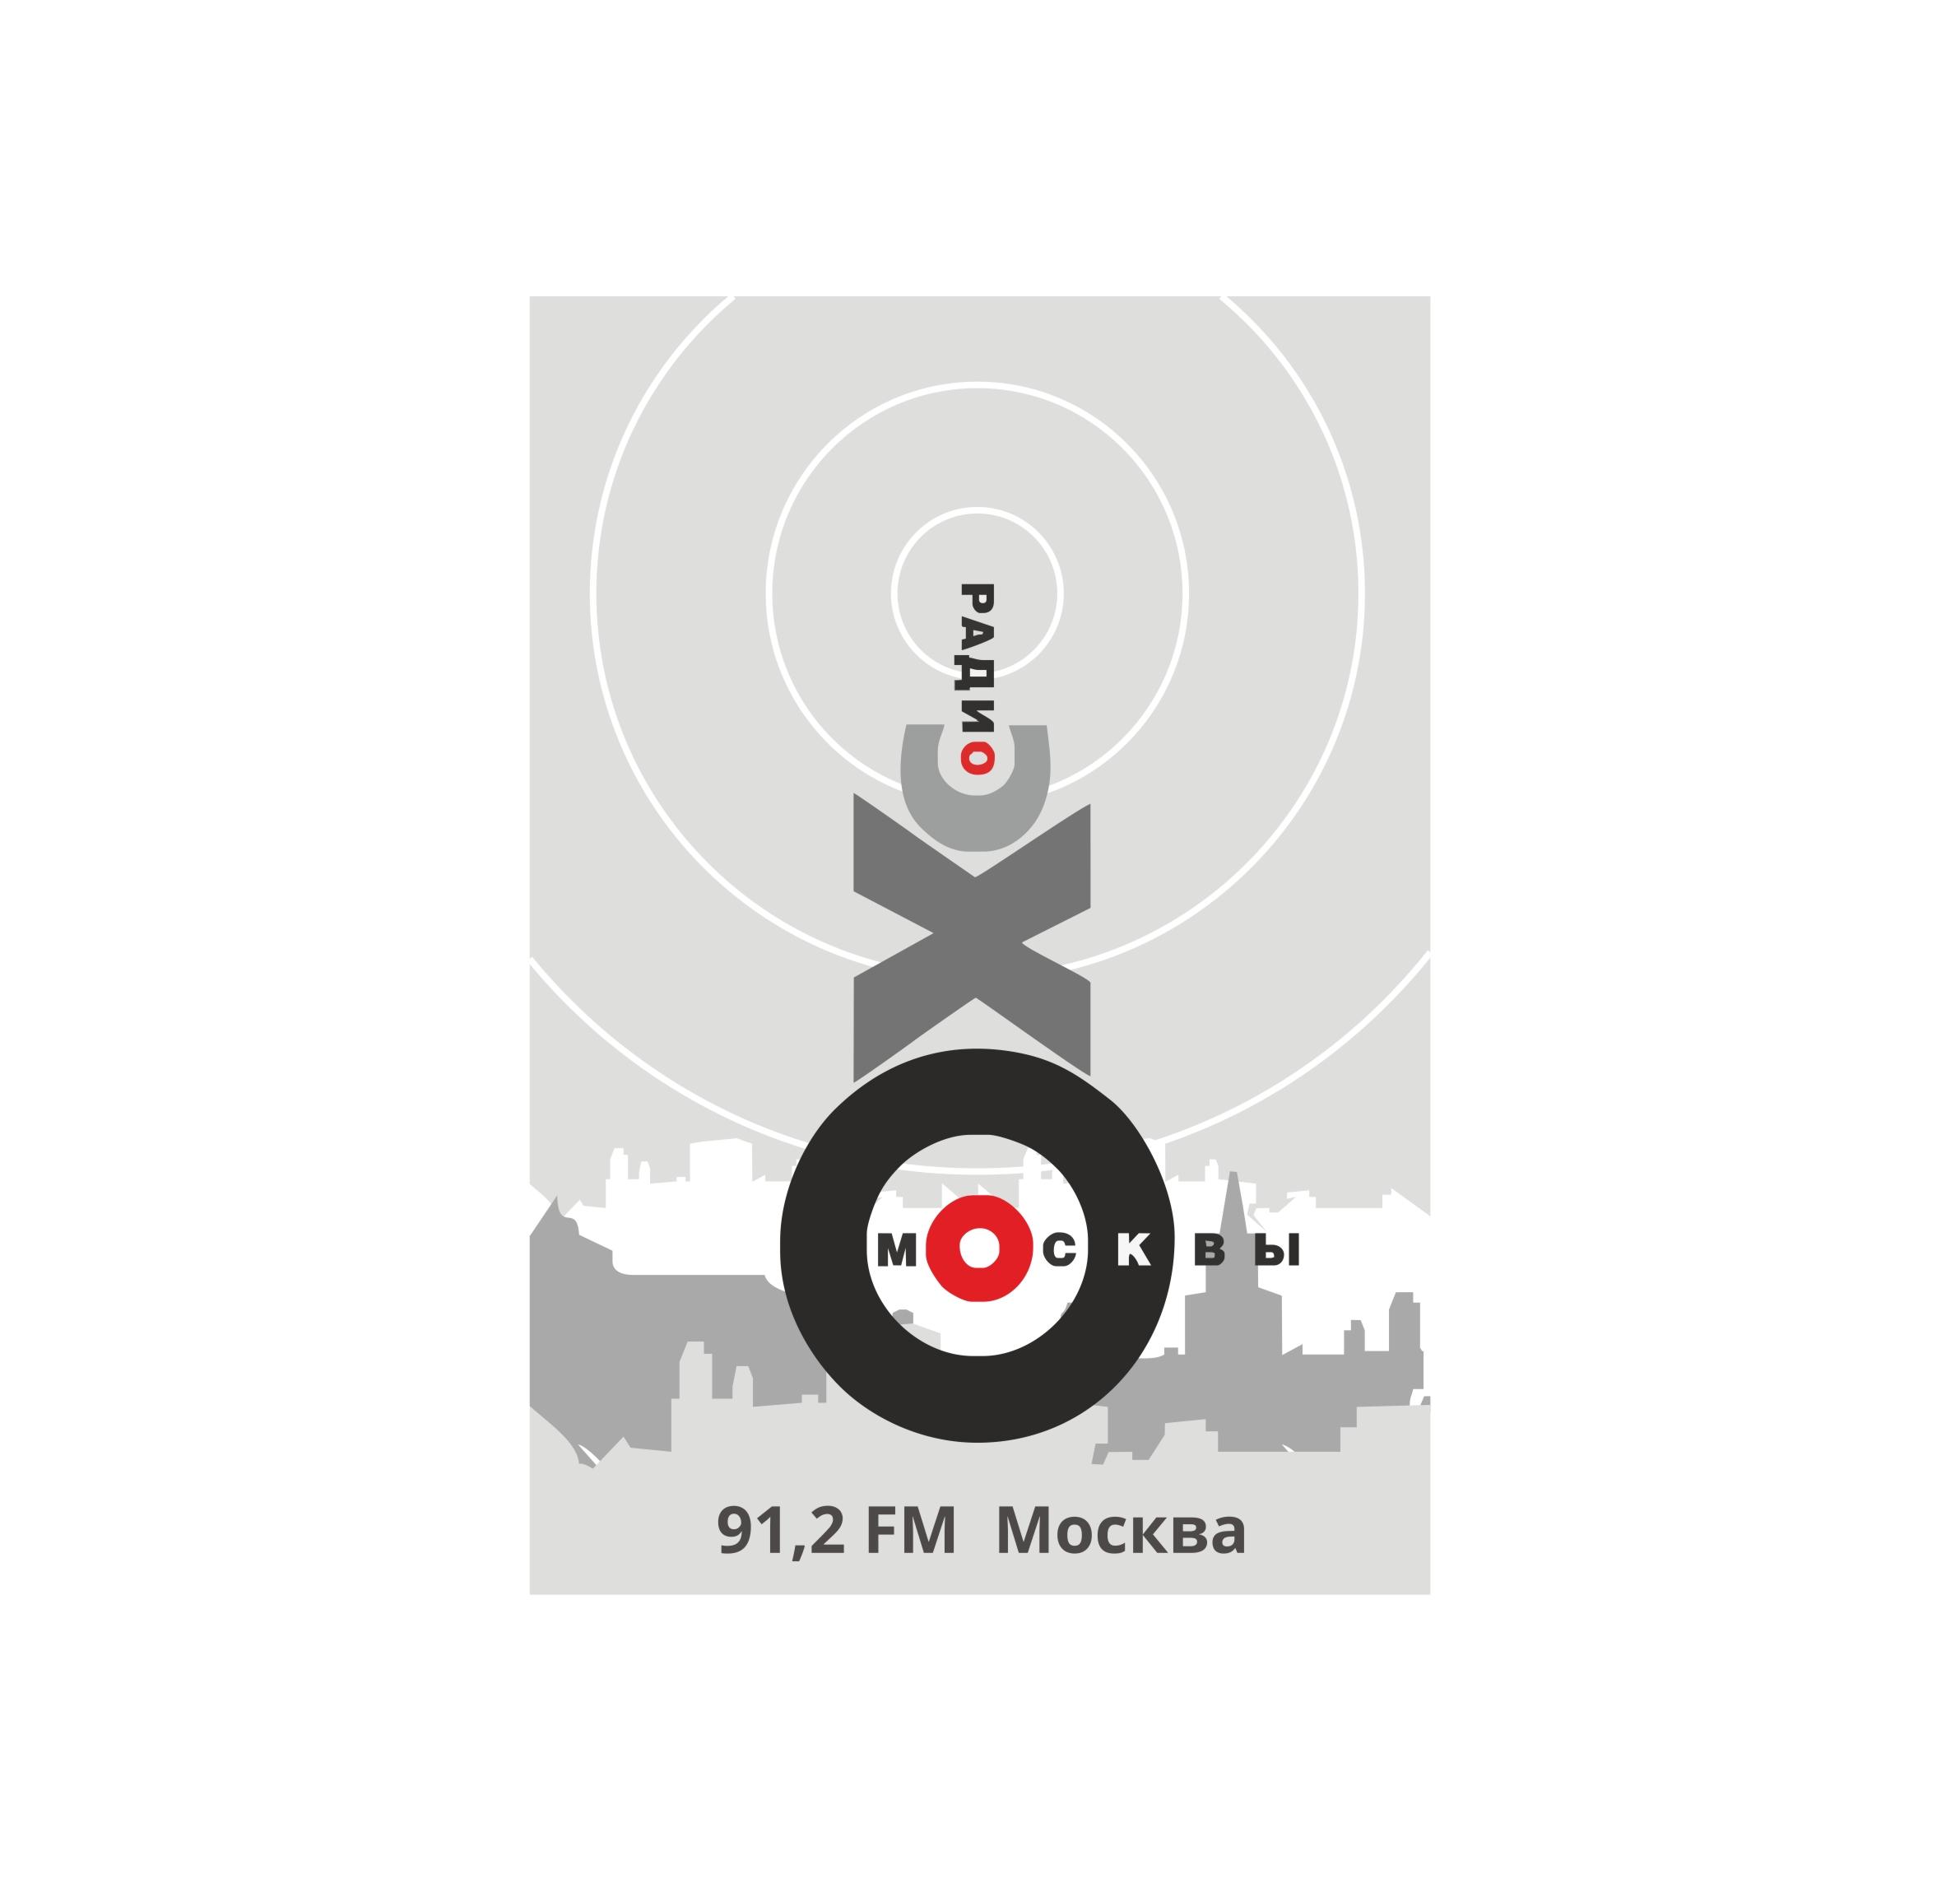 Дизайн логотипа р/с Эхо Москвы. фото f_276562291829c3c8.jpg